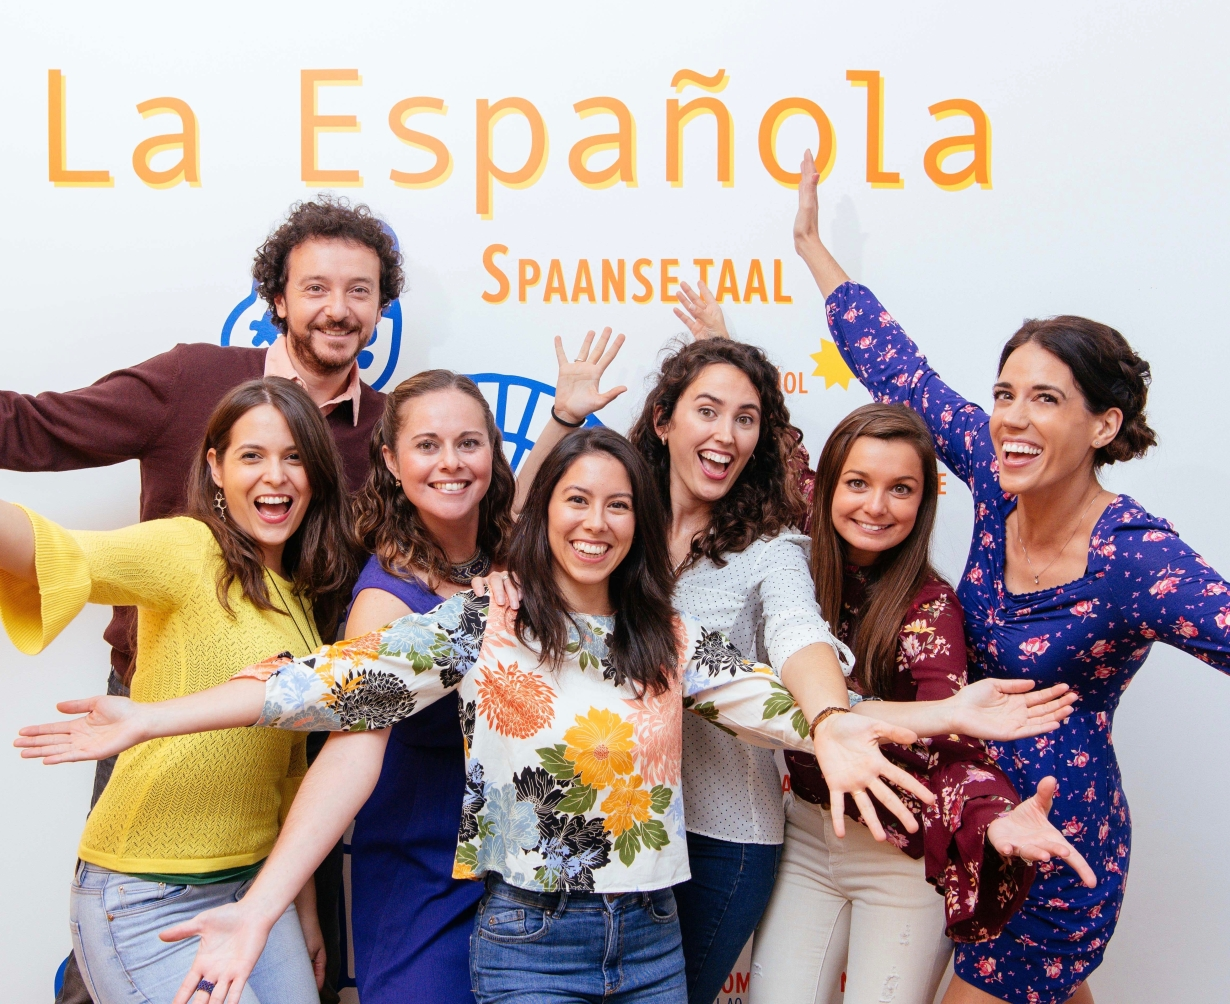 https://laespanolablog.files.wordpress.com/2014/12/amaya-gasull-patricia-maceda-garcia-leticia-pernas-oscar-brusca-isabel-bermejo-maria-jose-coello-adriana-lopez-saez-la-espanola-spaans-leren-rotterdam-spanish